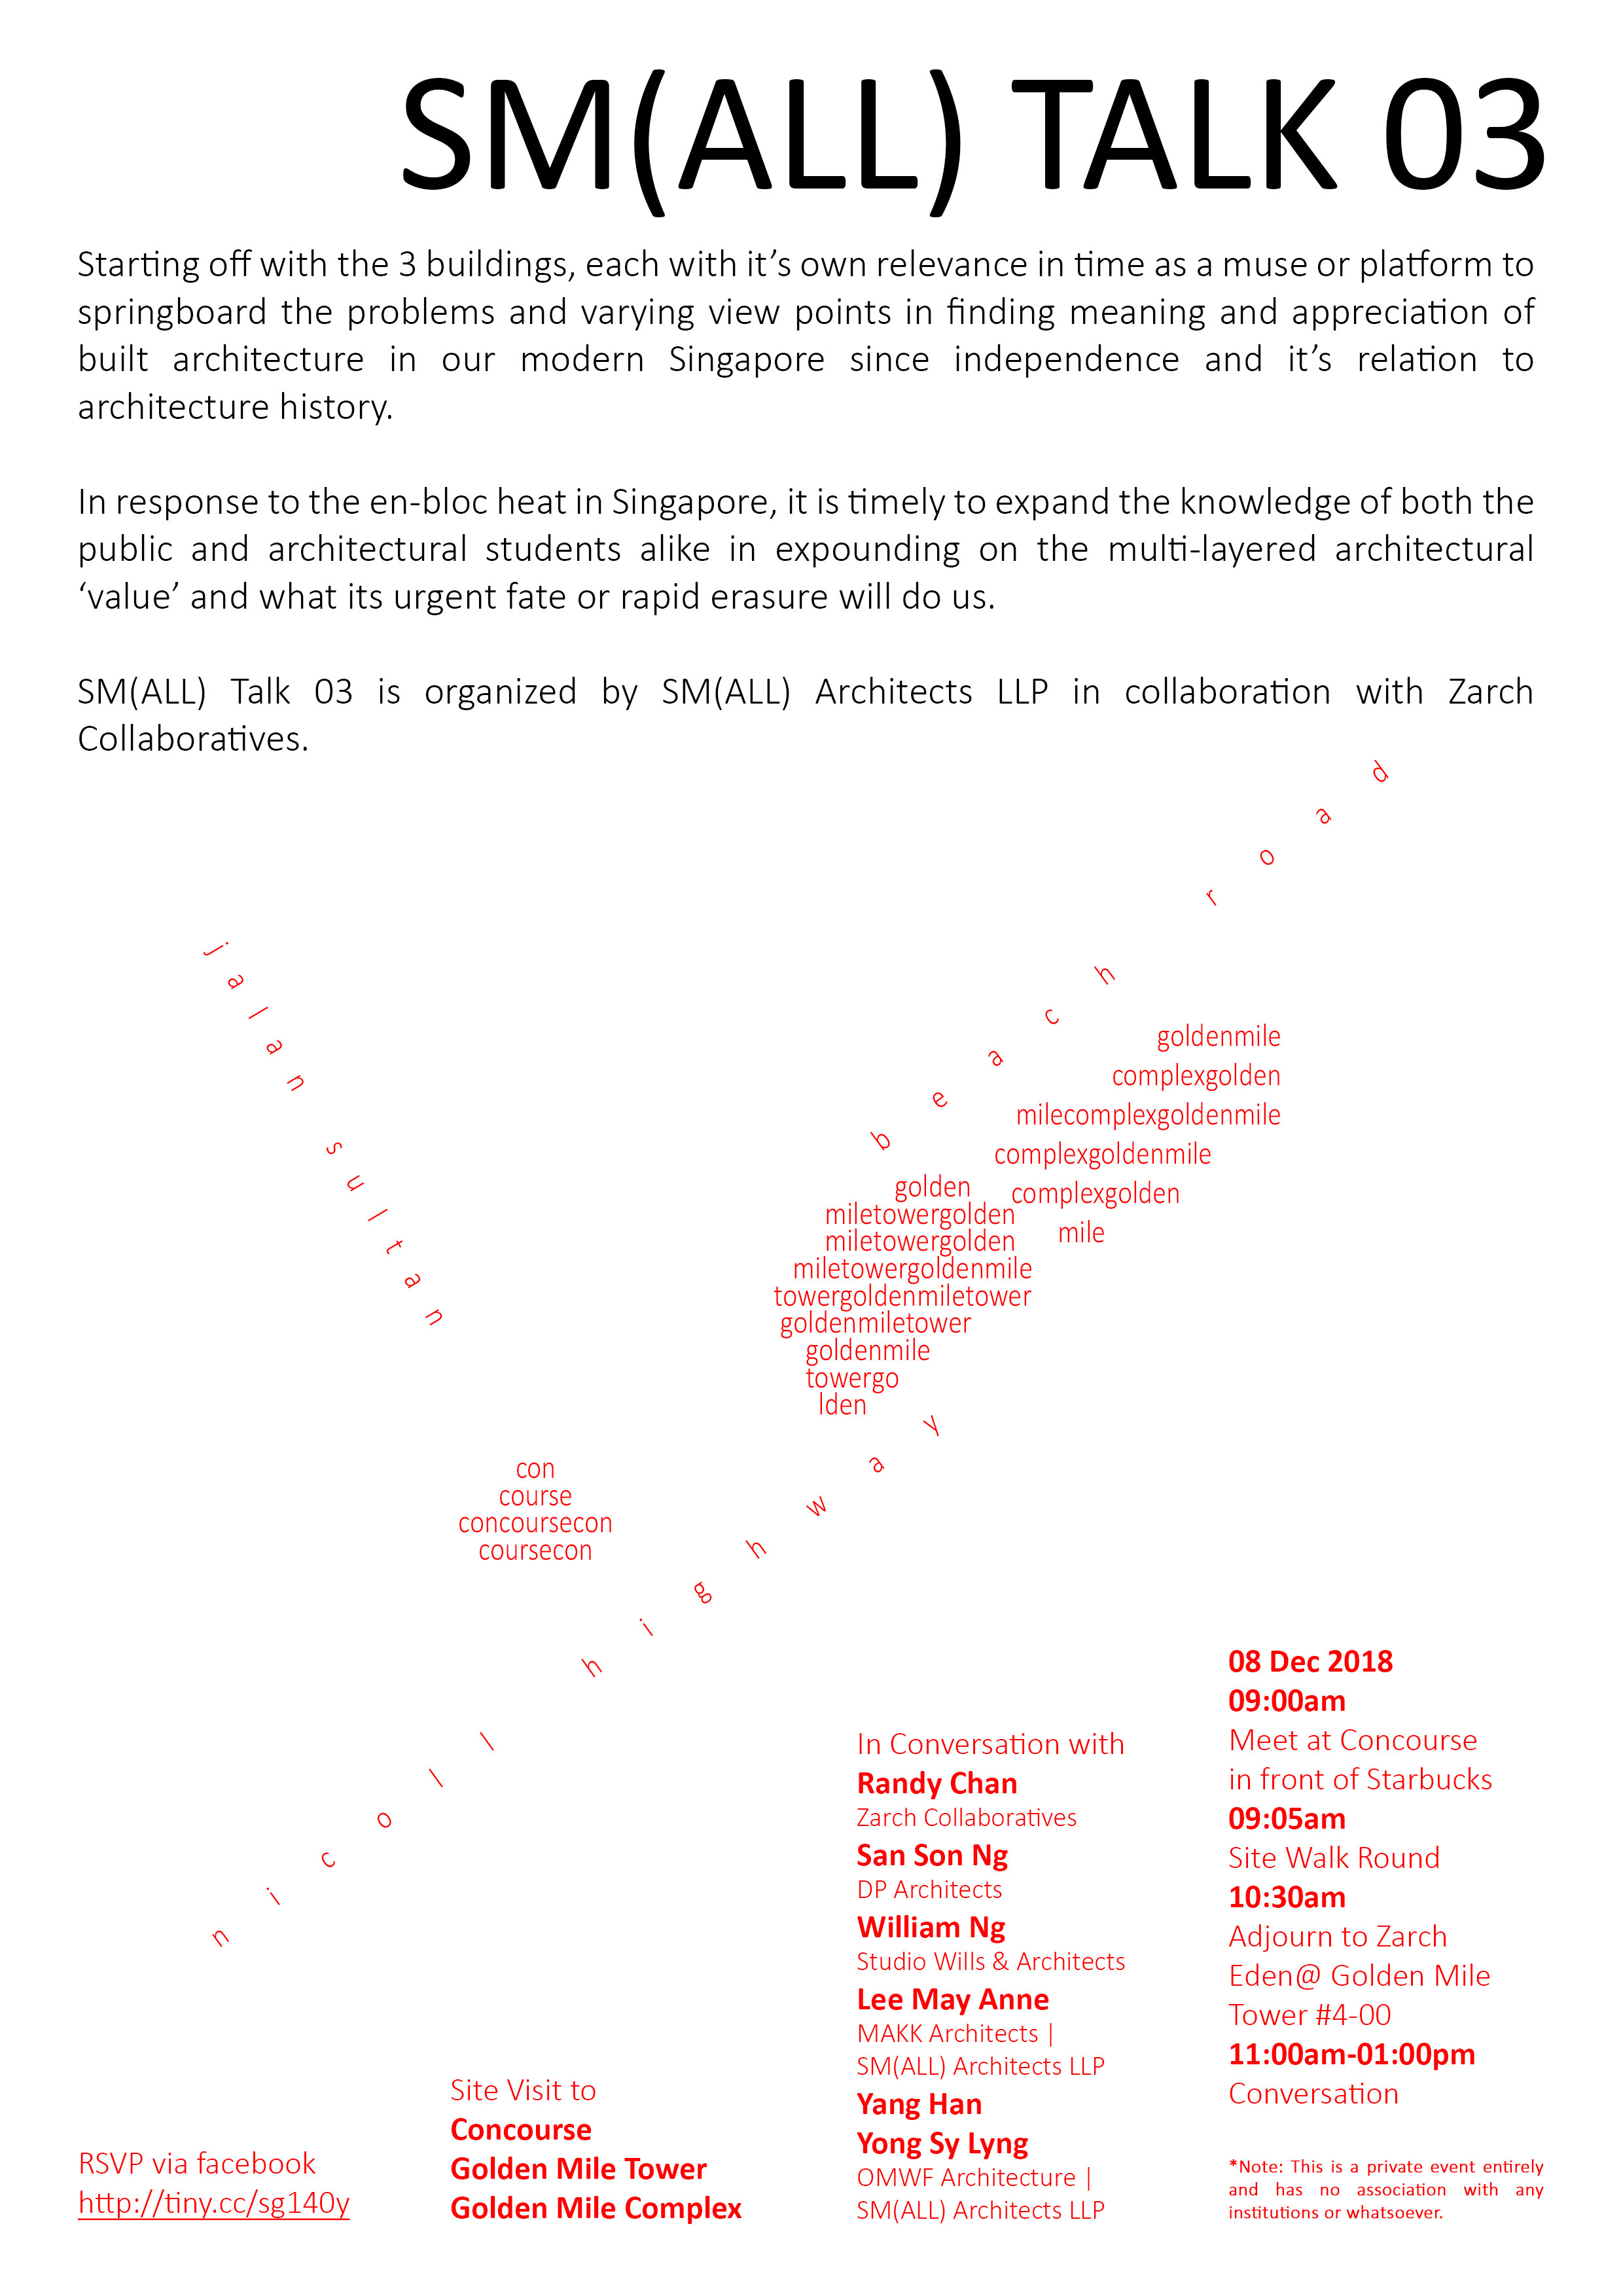 Small Talk — SM(ALL) ARCHITECTS